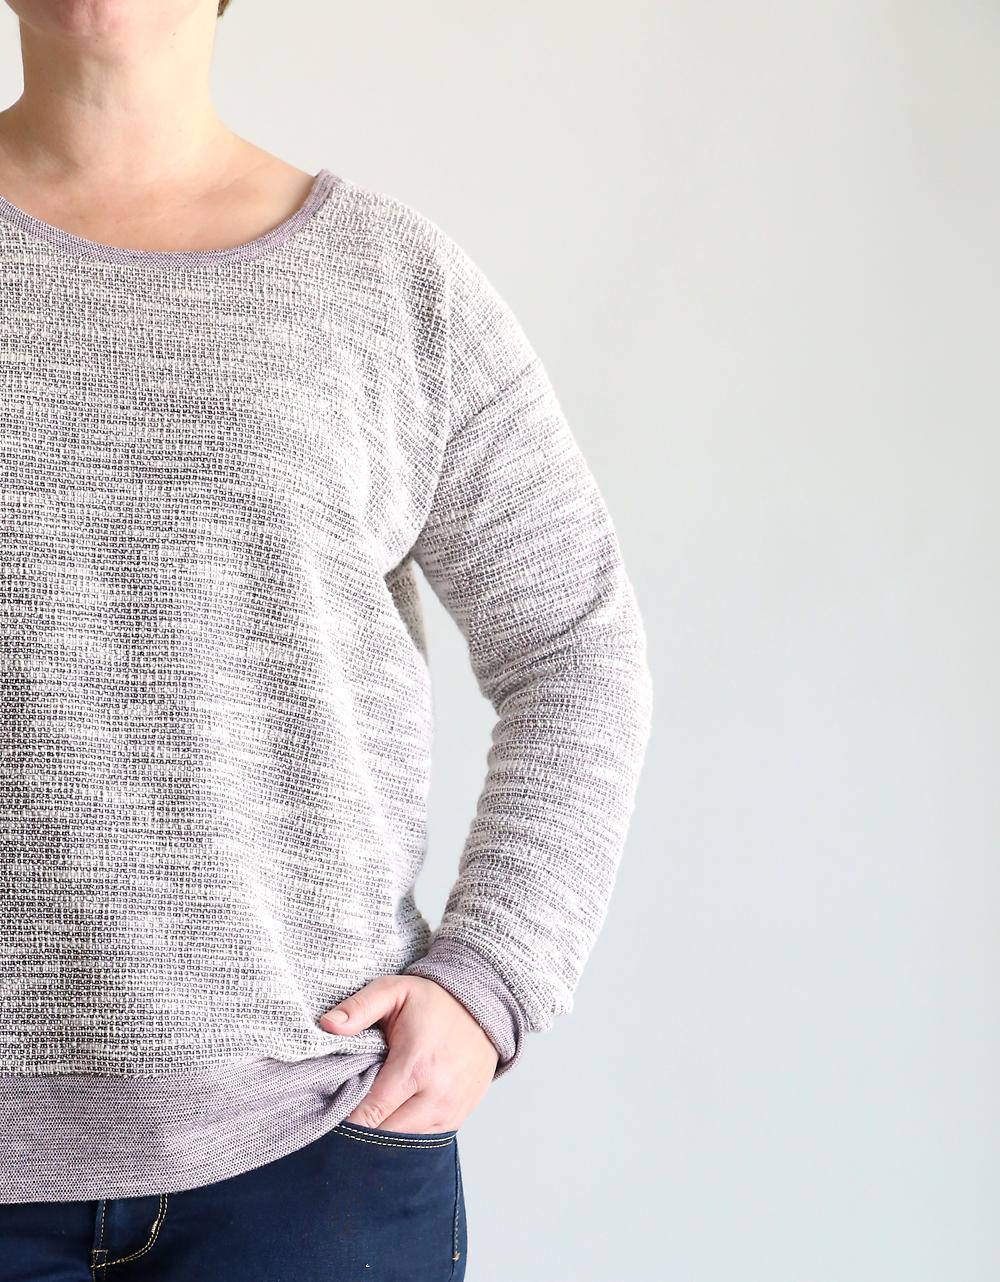 Closeup showing sleeve of slouchy sweatshirt